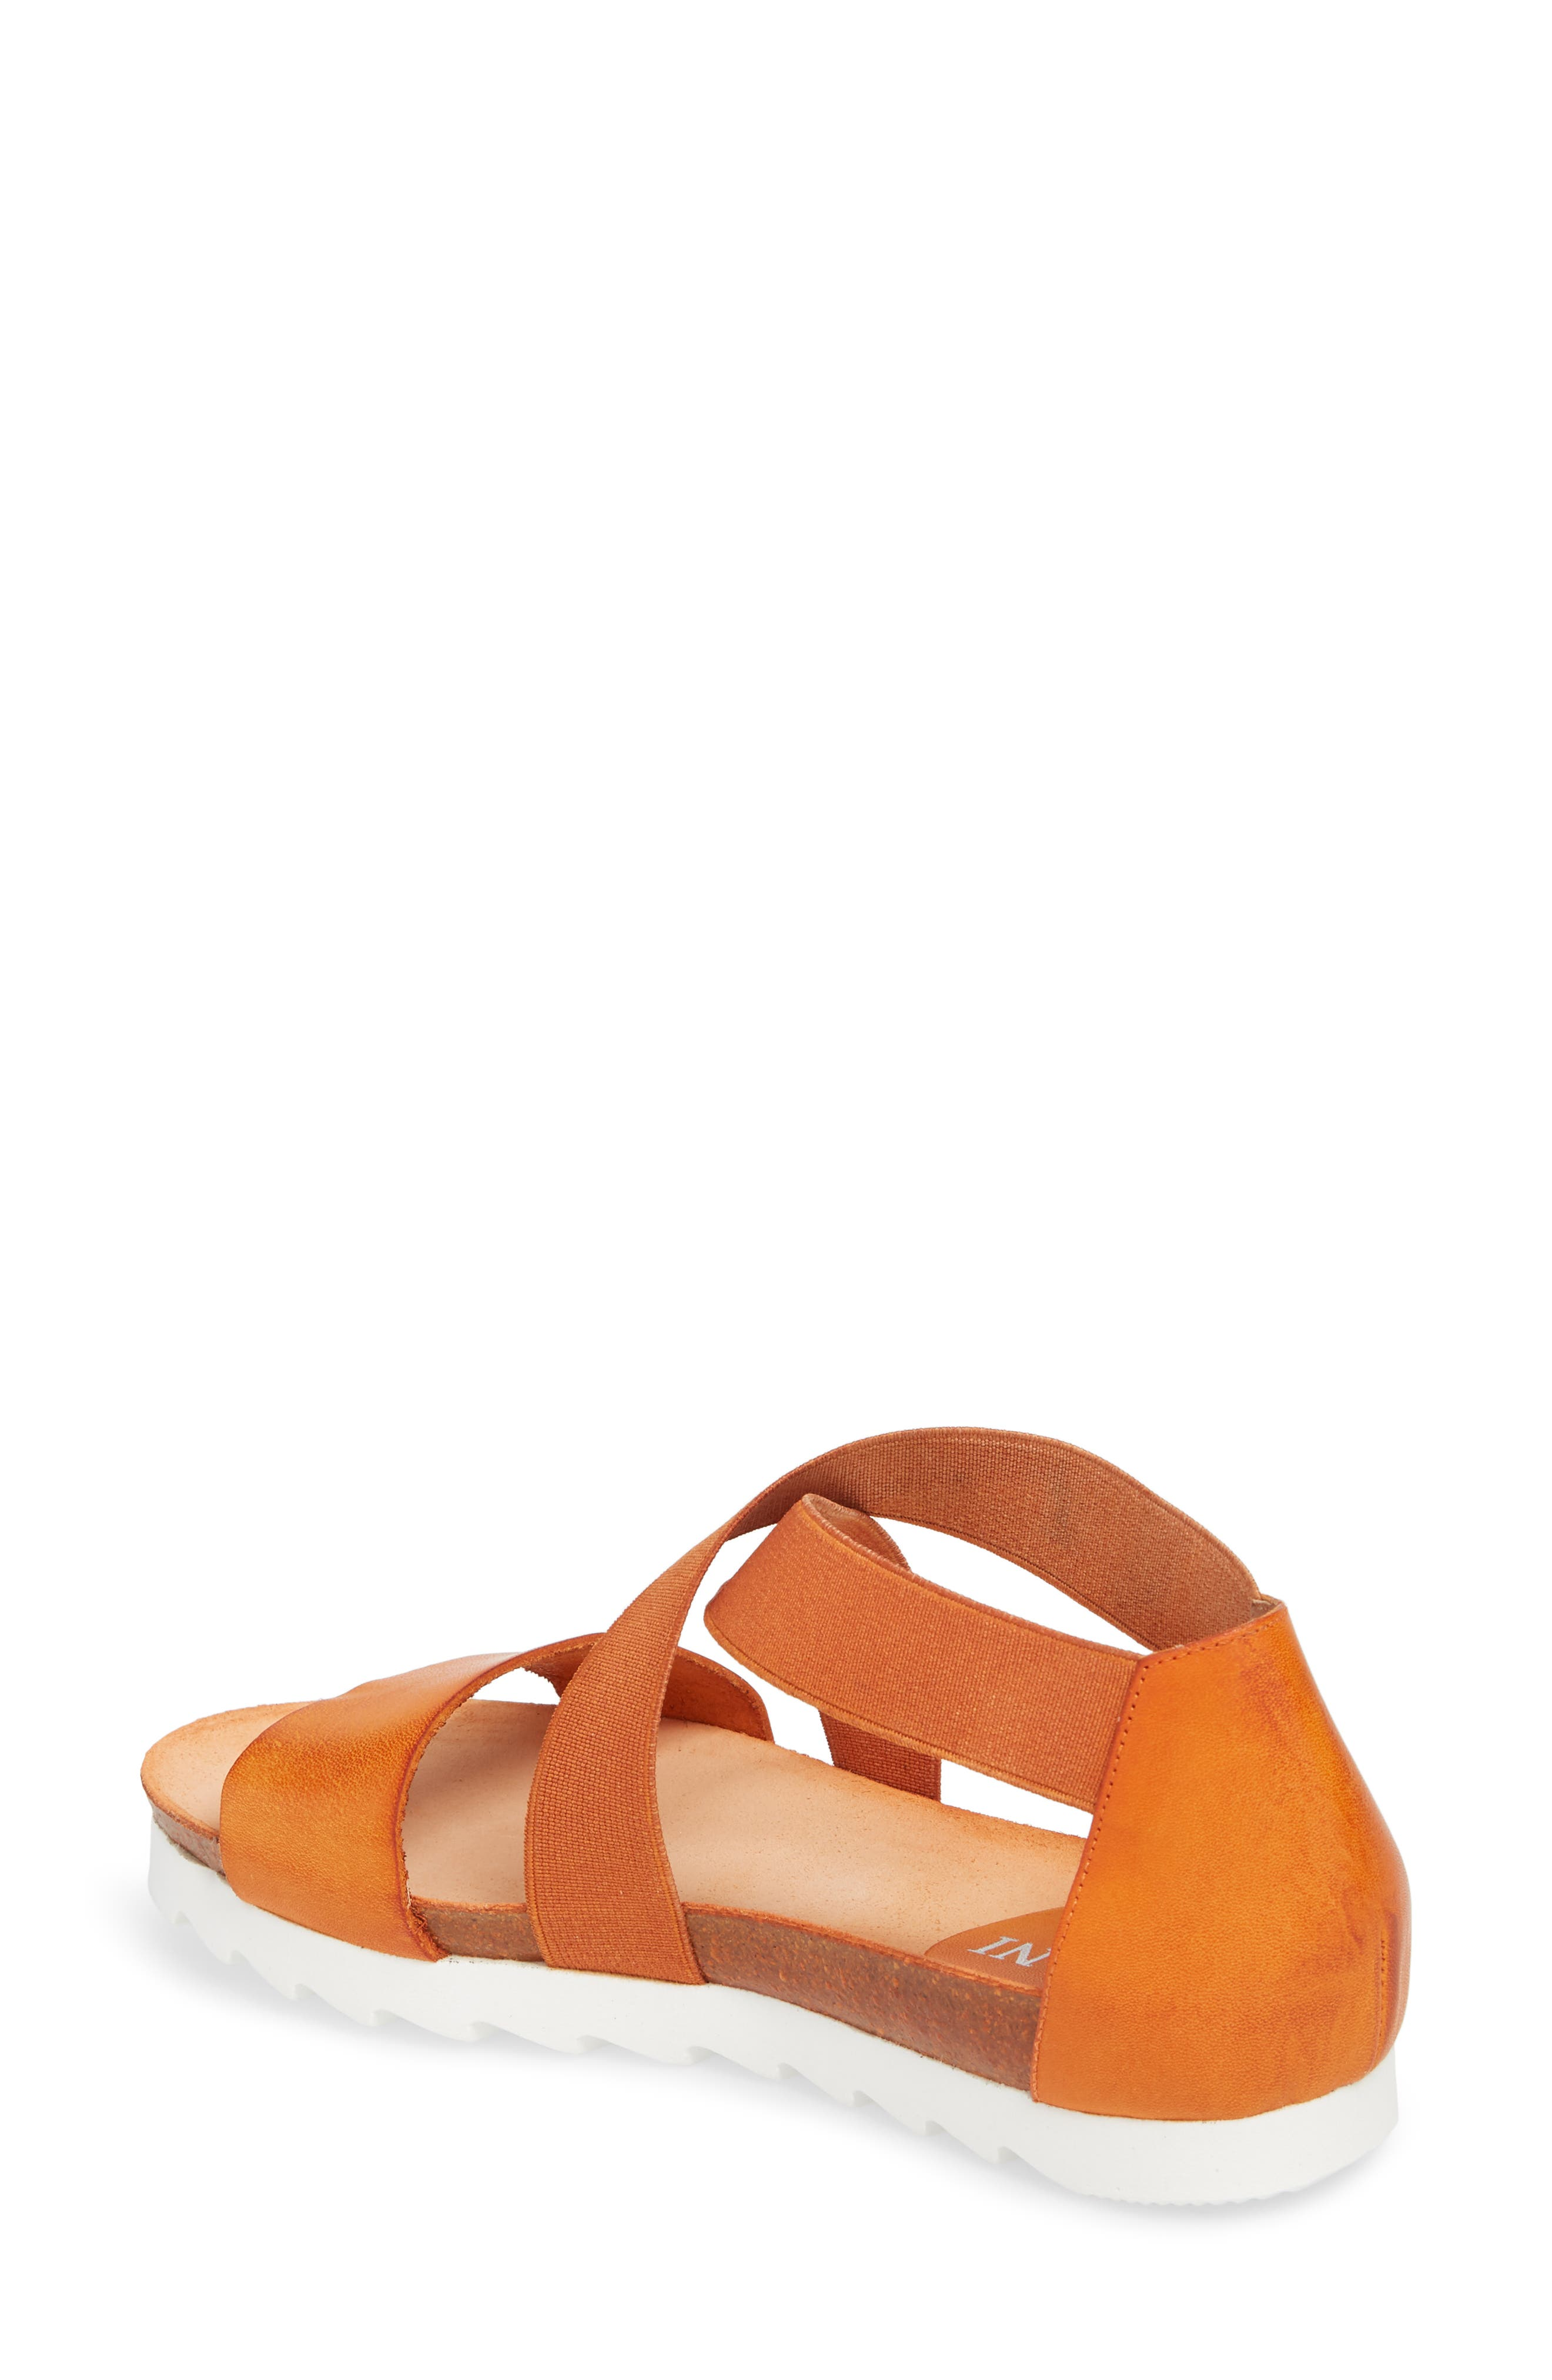 Sayger Sandal,                             Alternate thumbnail 2, color,                             Orange Leather